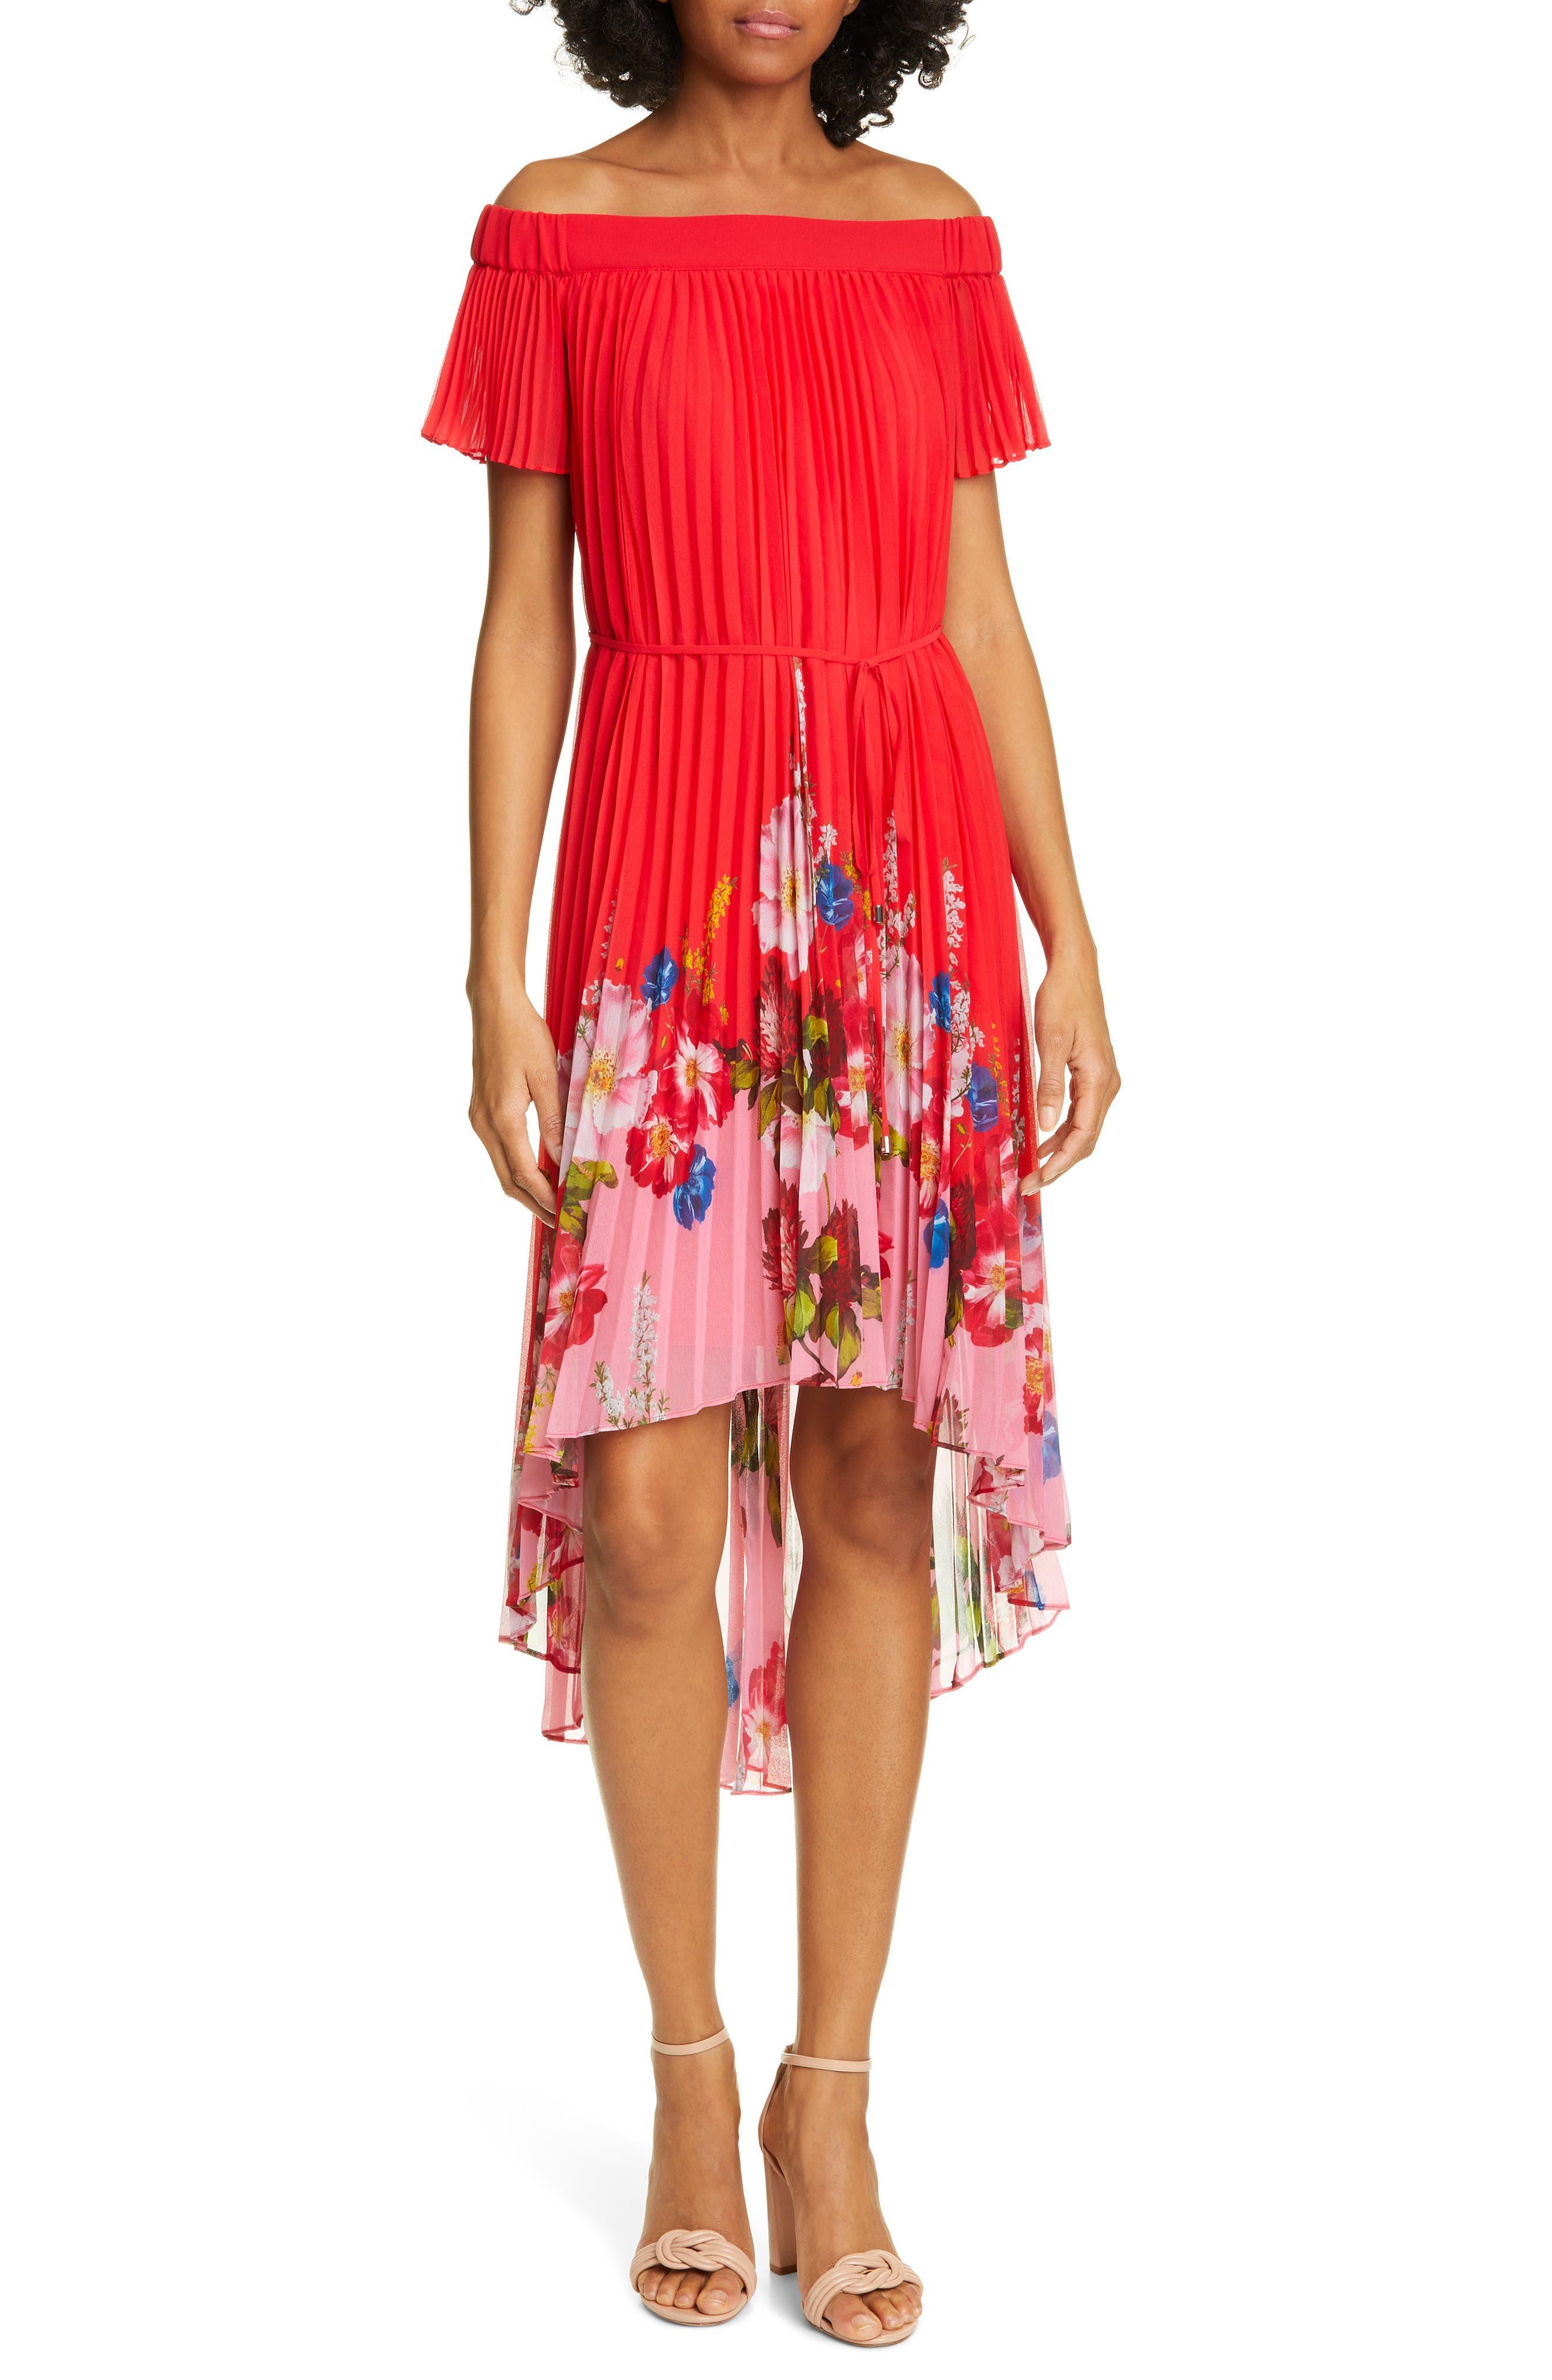 Ted Baker London Berry Sundae Floral Pleat Off The Shoulder Dress, Red